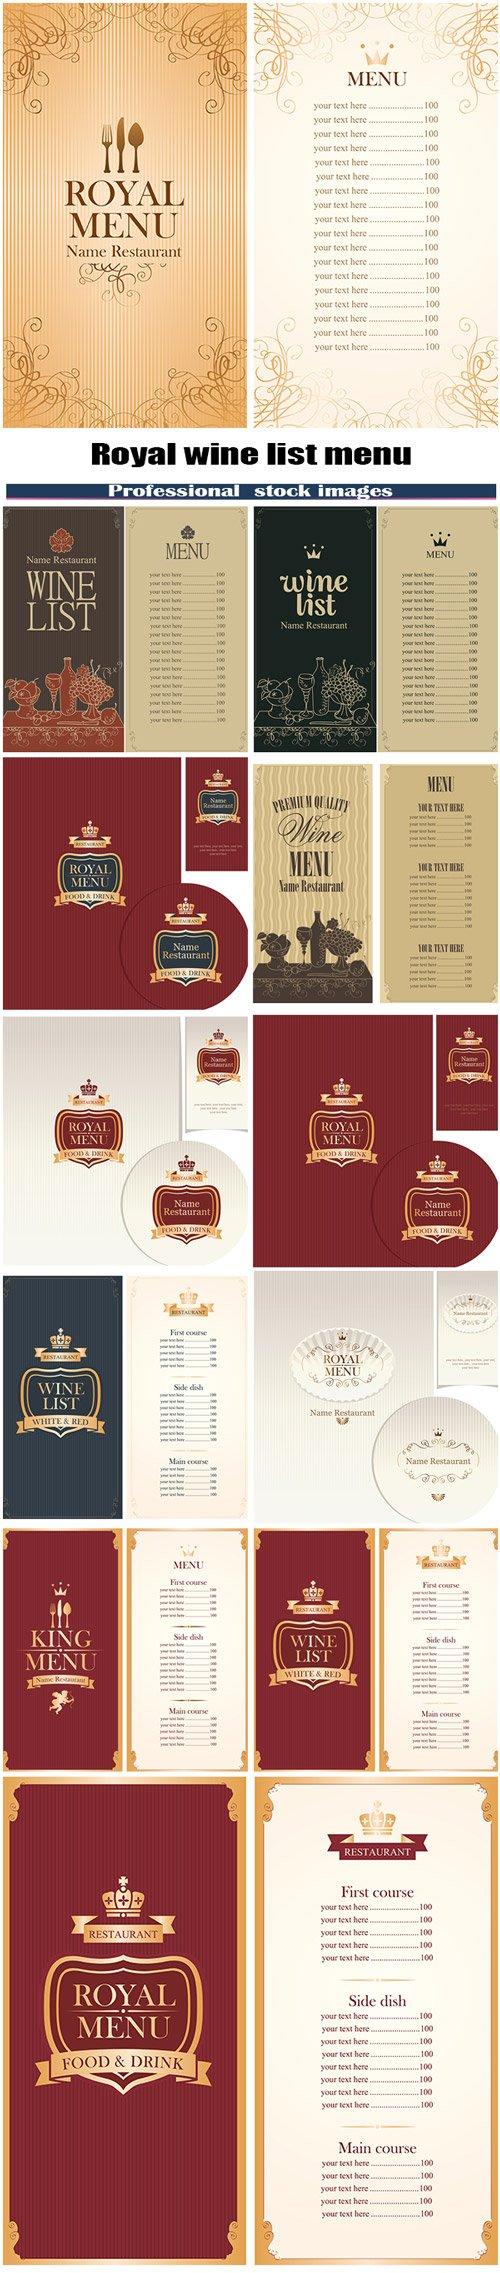 Royal wine list menu